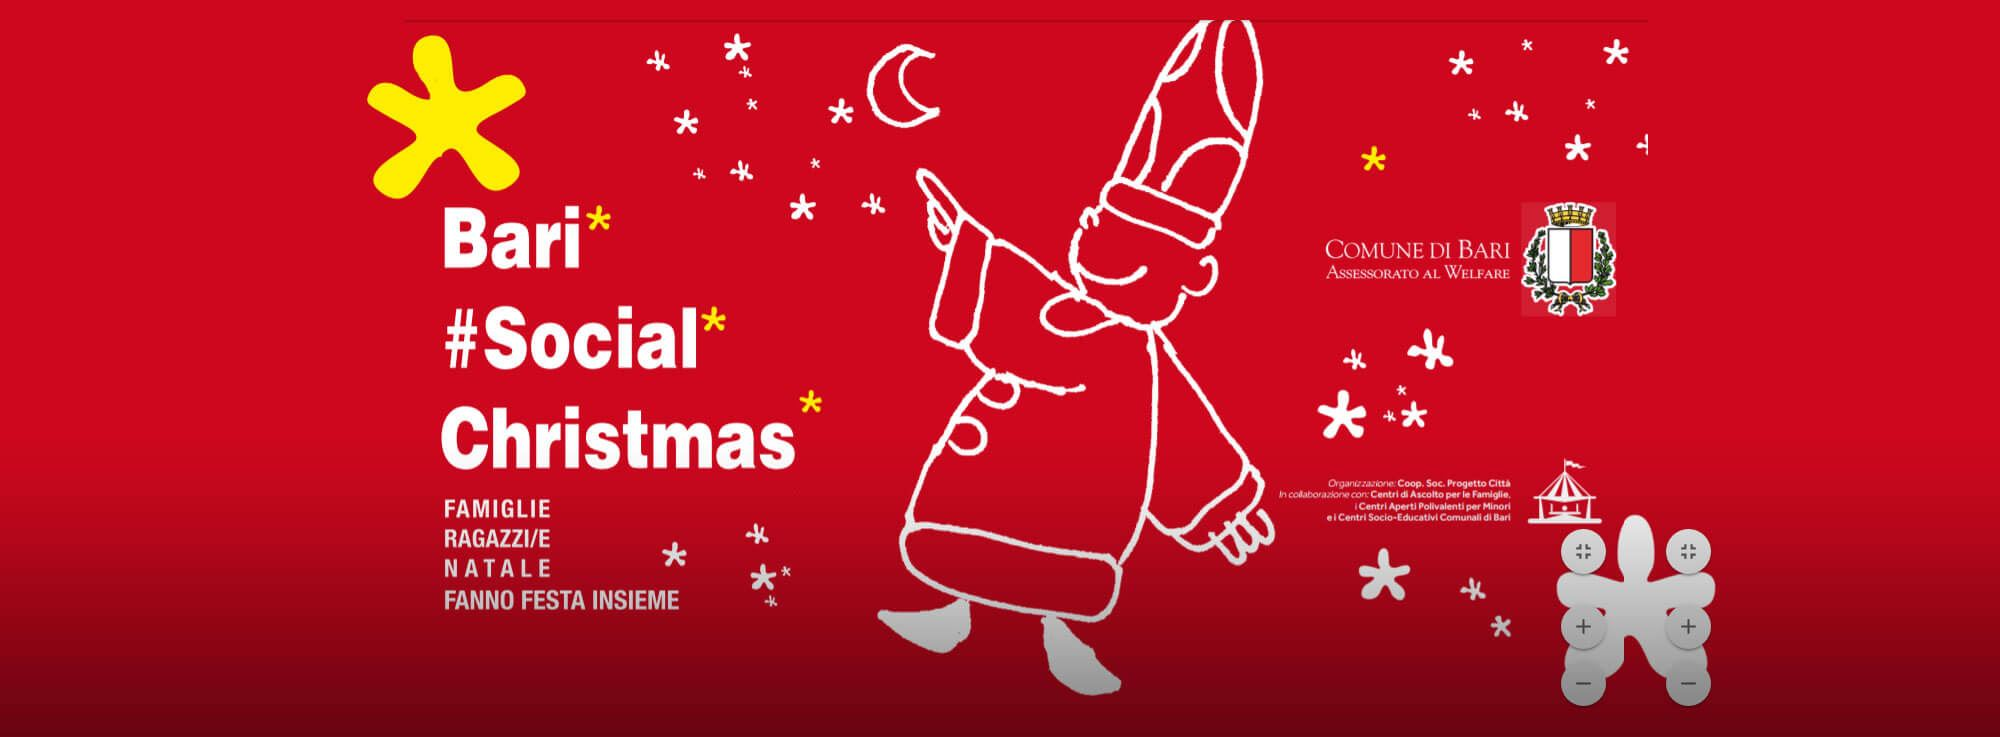 Bari: Bari Social Christmas